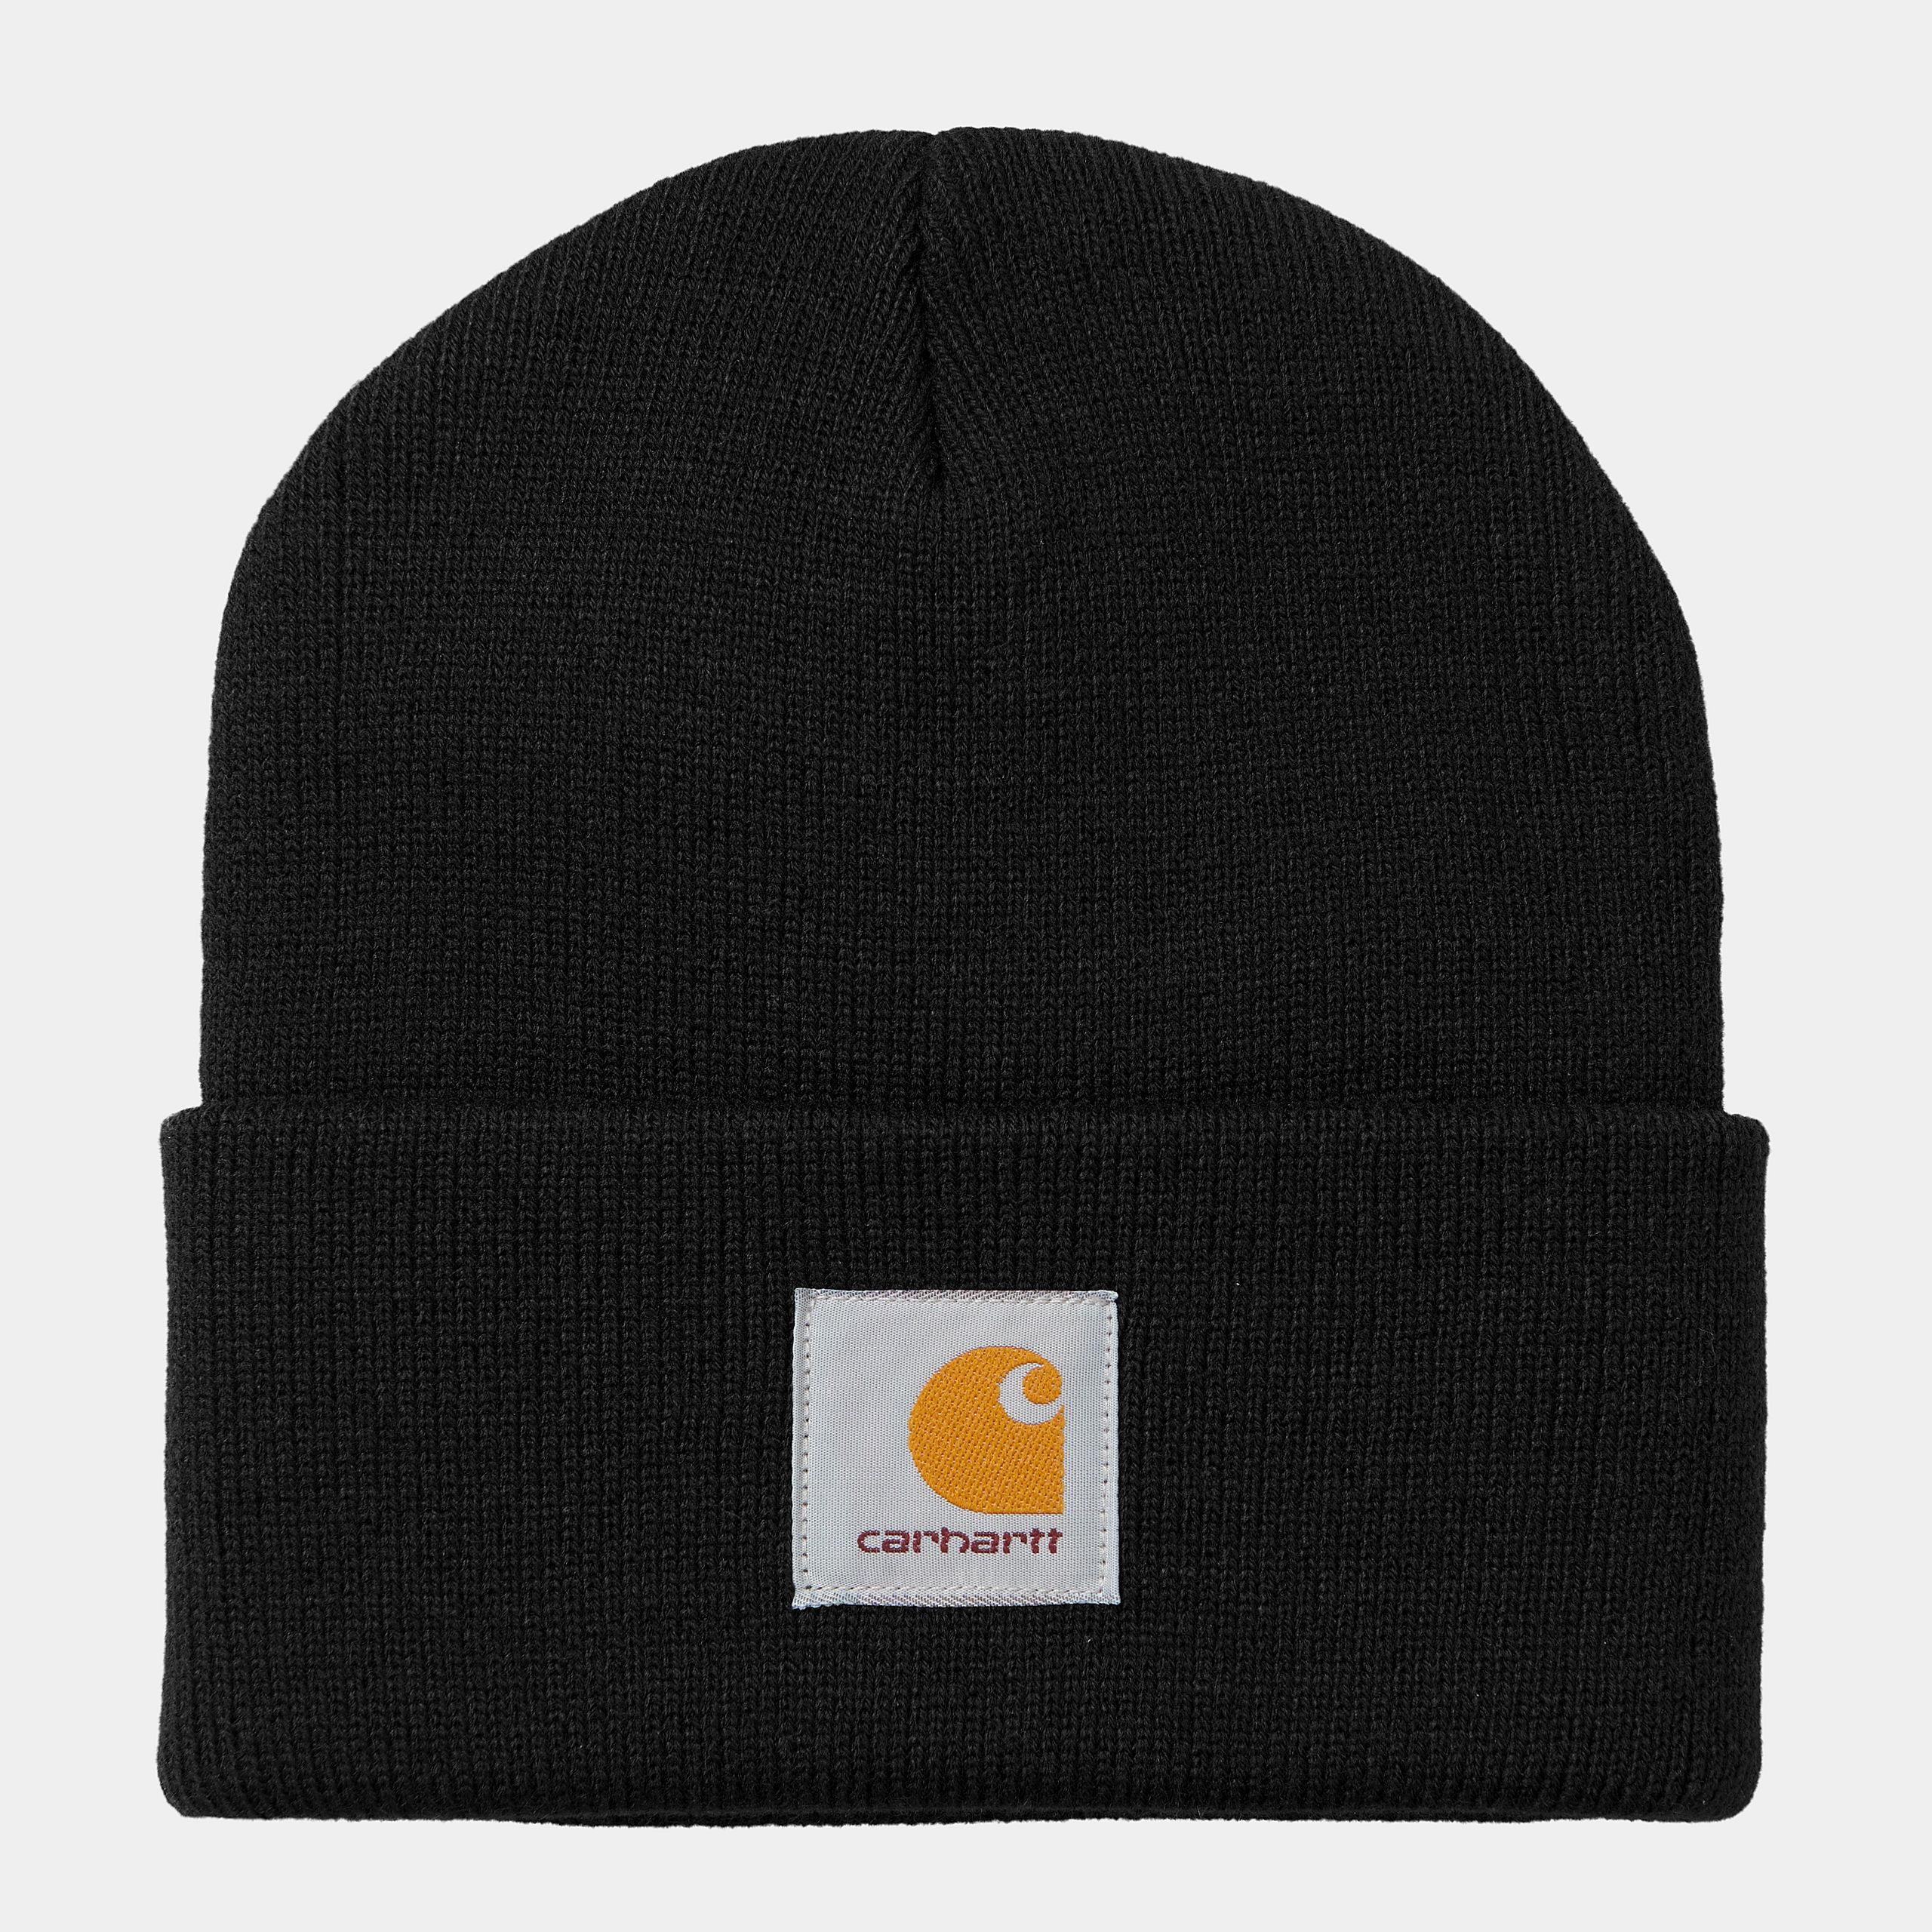 Carhartt WIP - SHORT WATCH HAT - Black